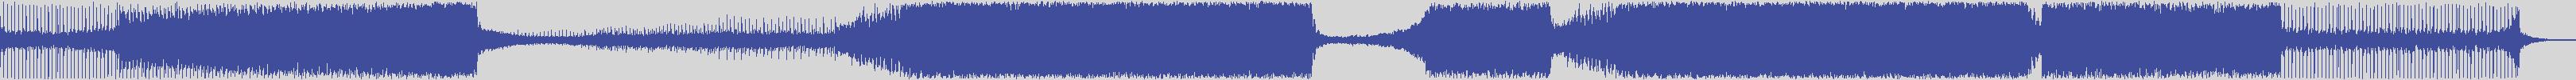 just_digital_records [JS1219] Negativefaces - We Were Young [Memories Mix] audio wave form